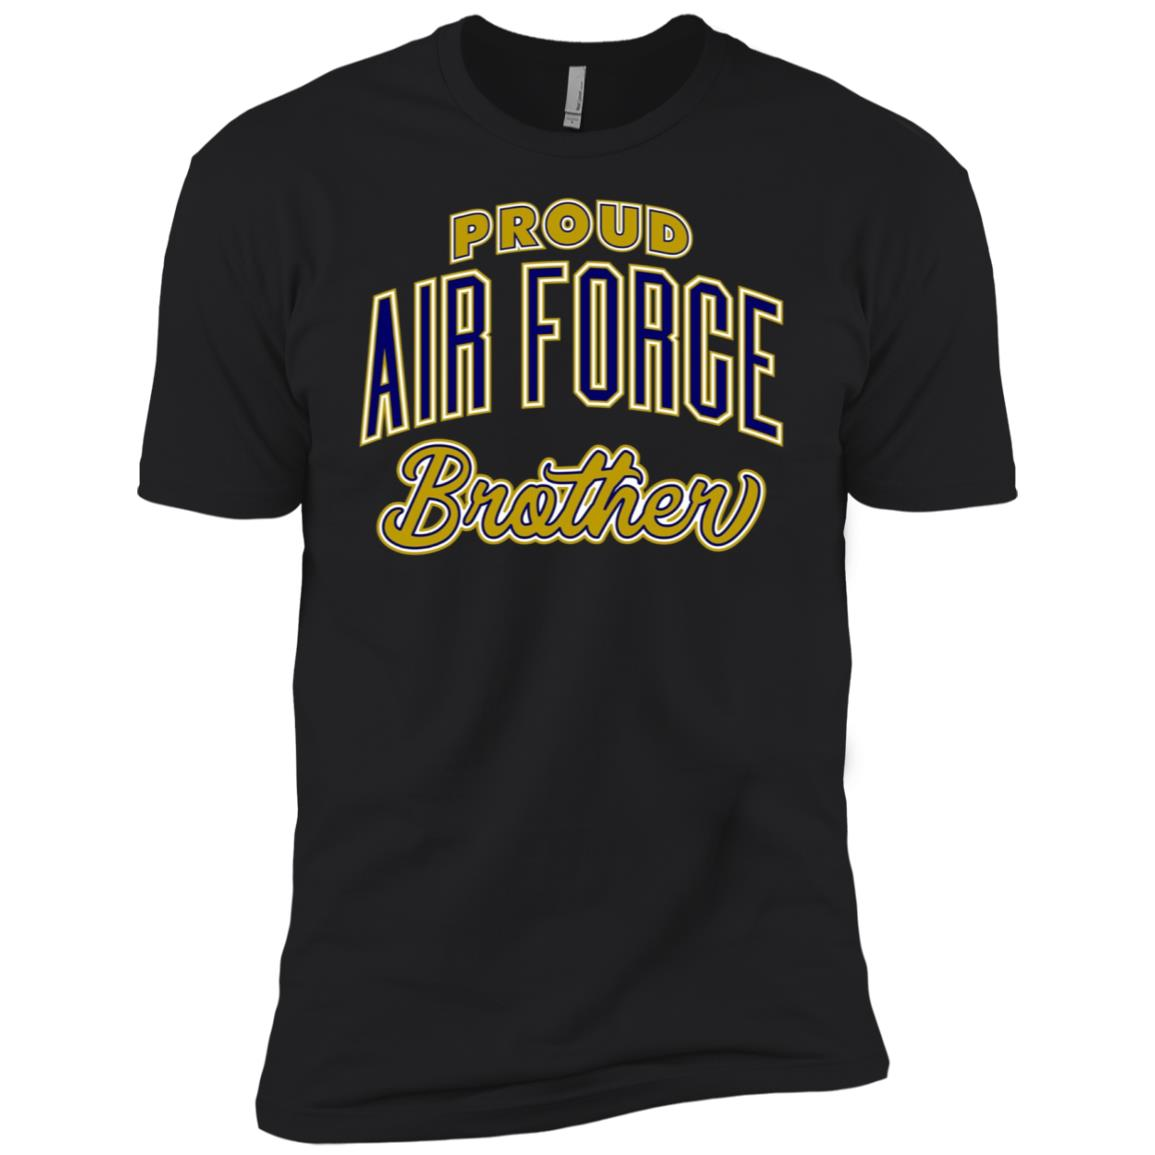 Proud Air Force Brother Men Short Sleeve T-Shirt